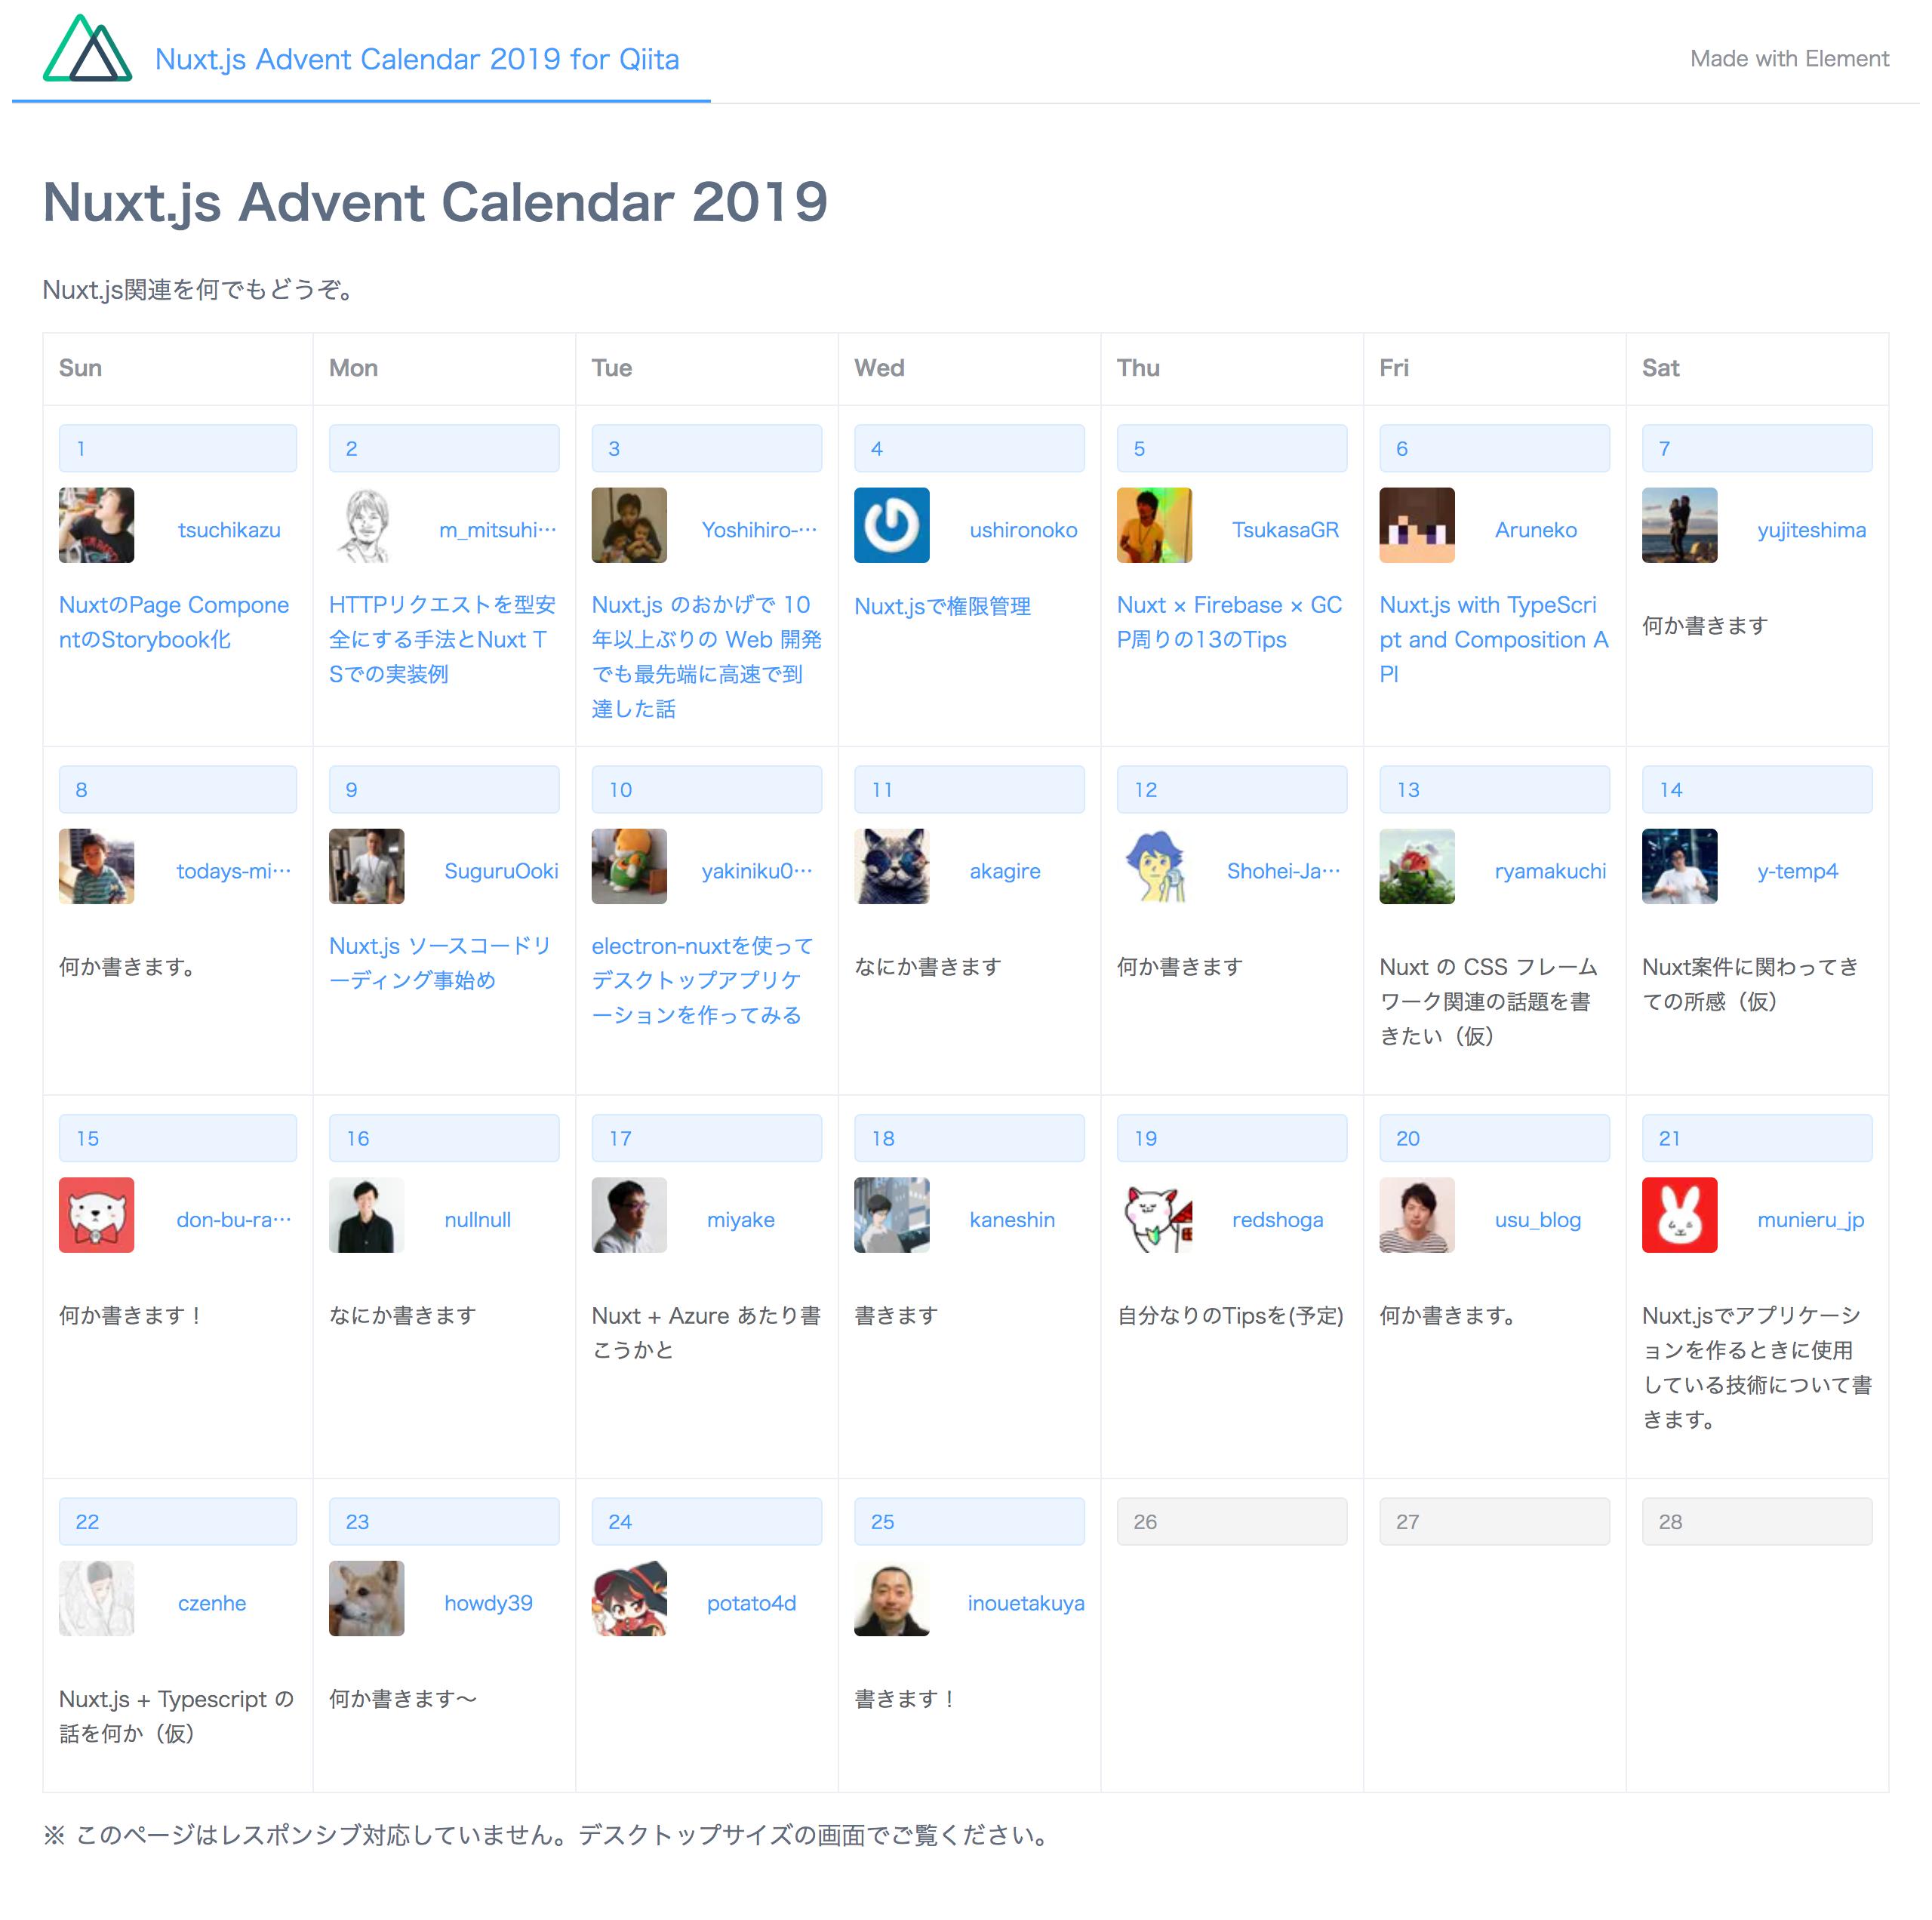 advent-calendar-2019-element-ui.netlify.com.png